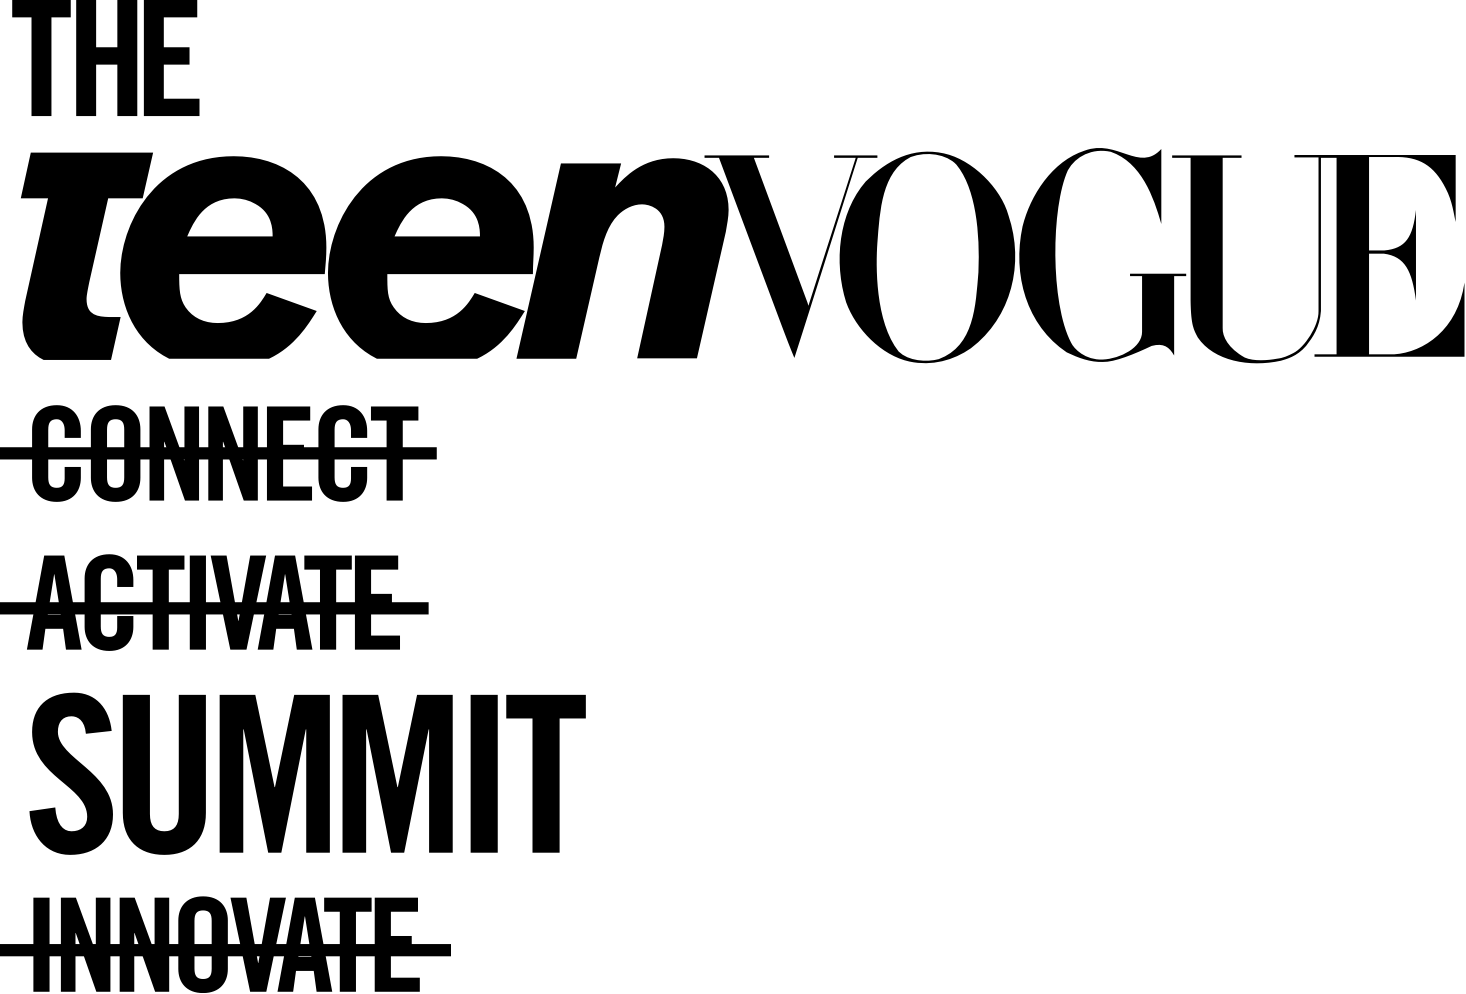 logo_teen_vogue_summit.png